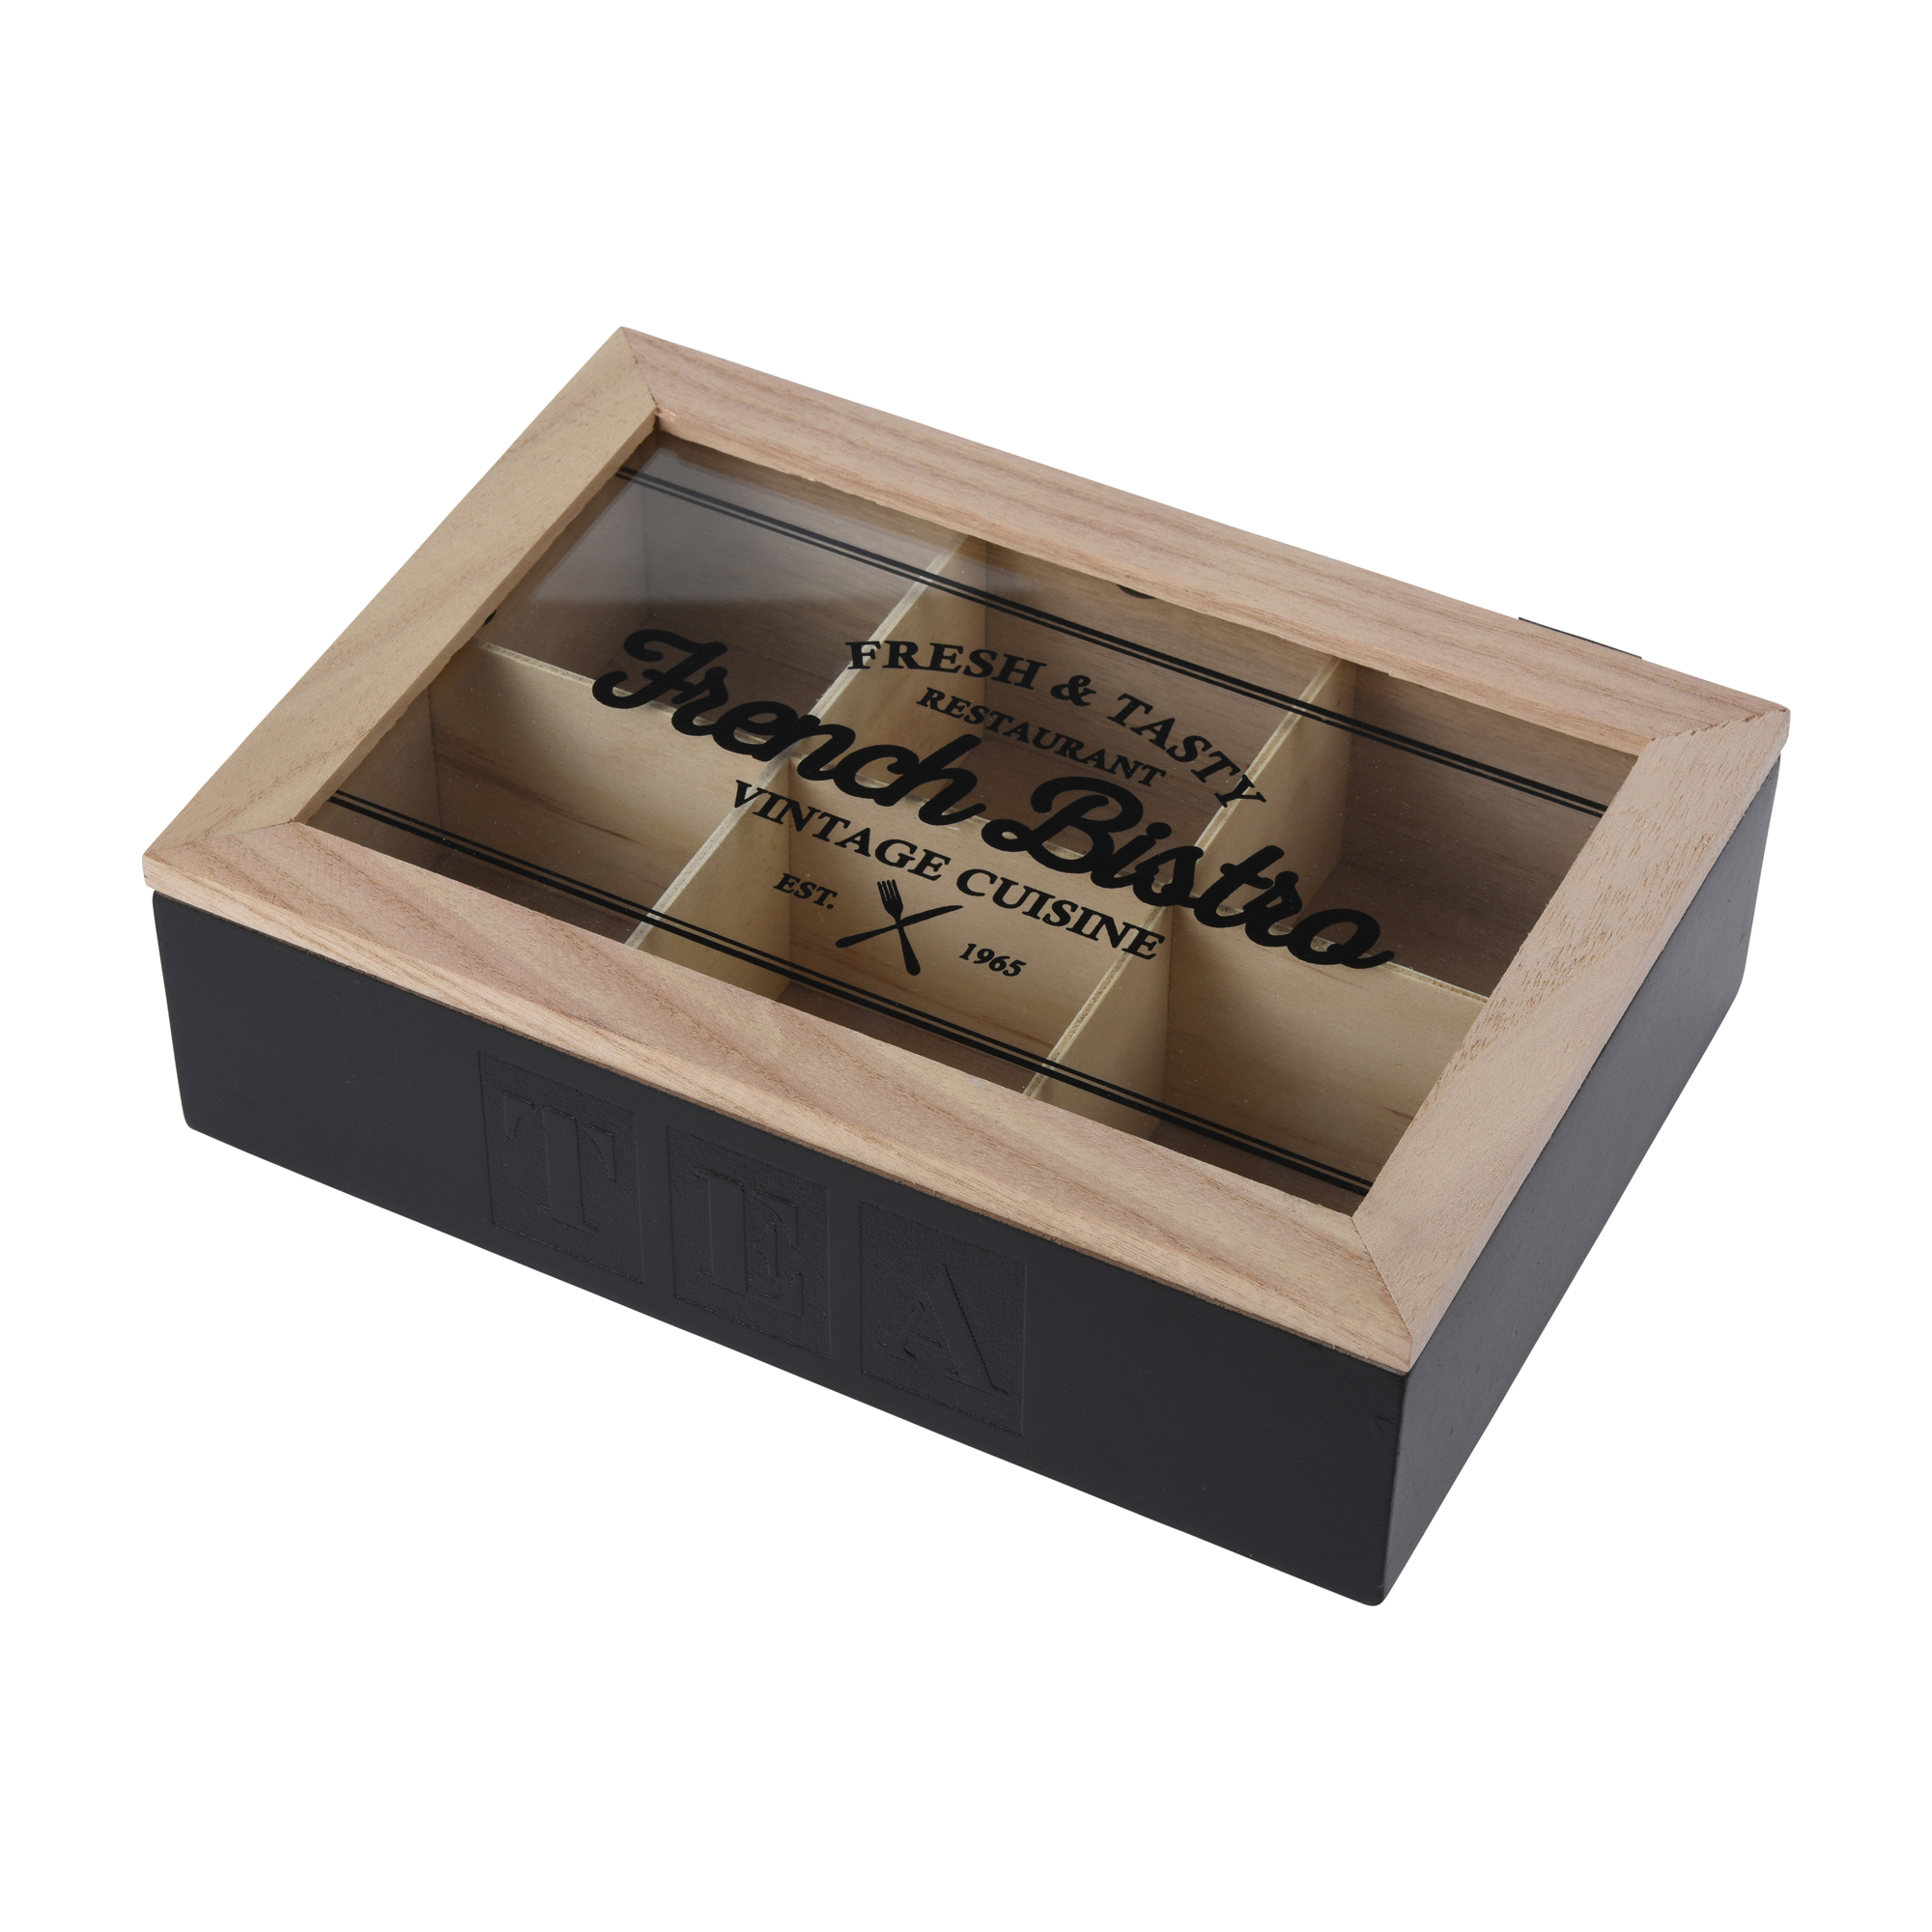 Фото - Коробка для чайных пакетиков Koopman 24x16,8x7 см подставка для чайных пакетиков